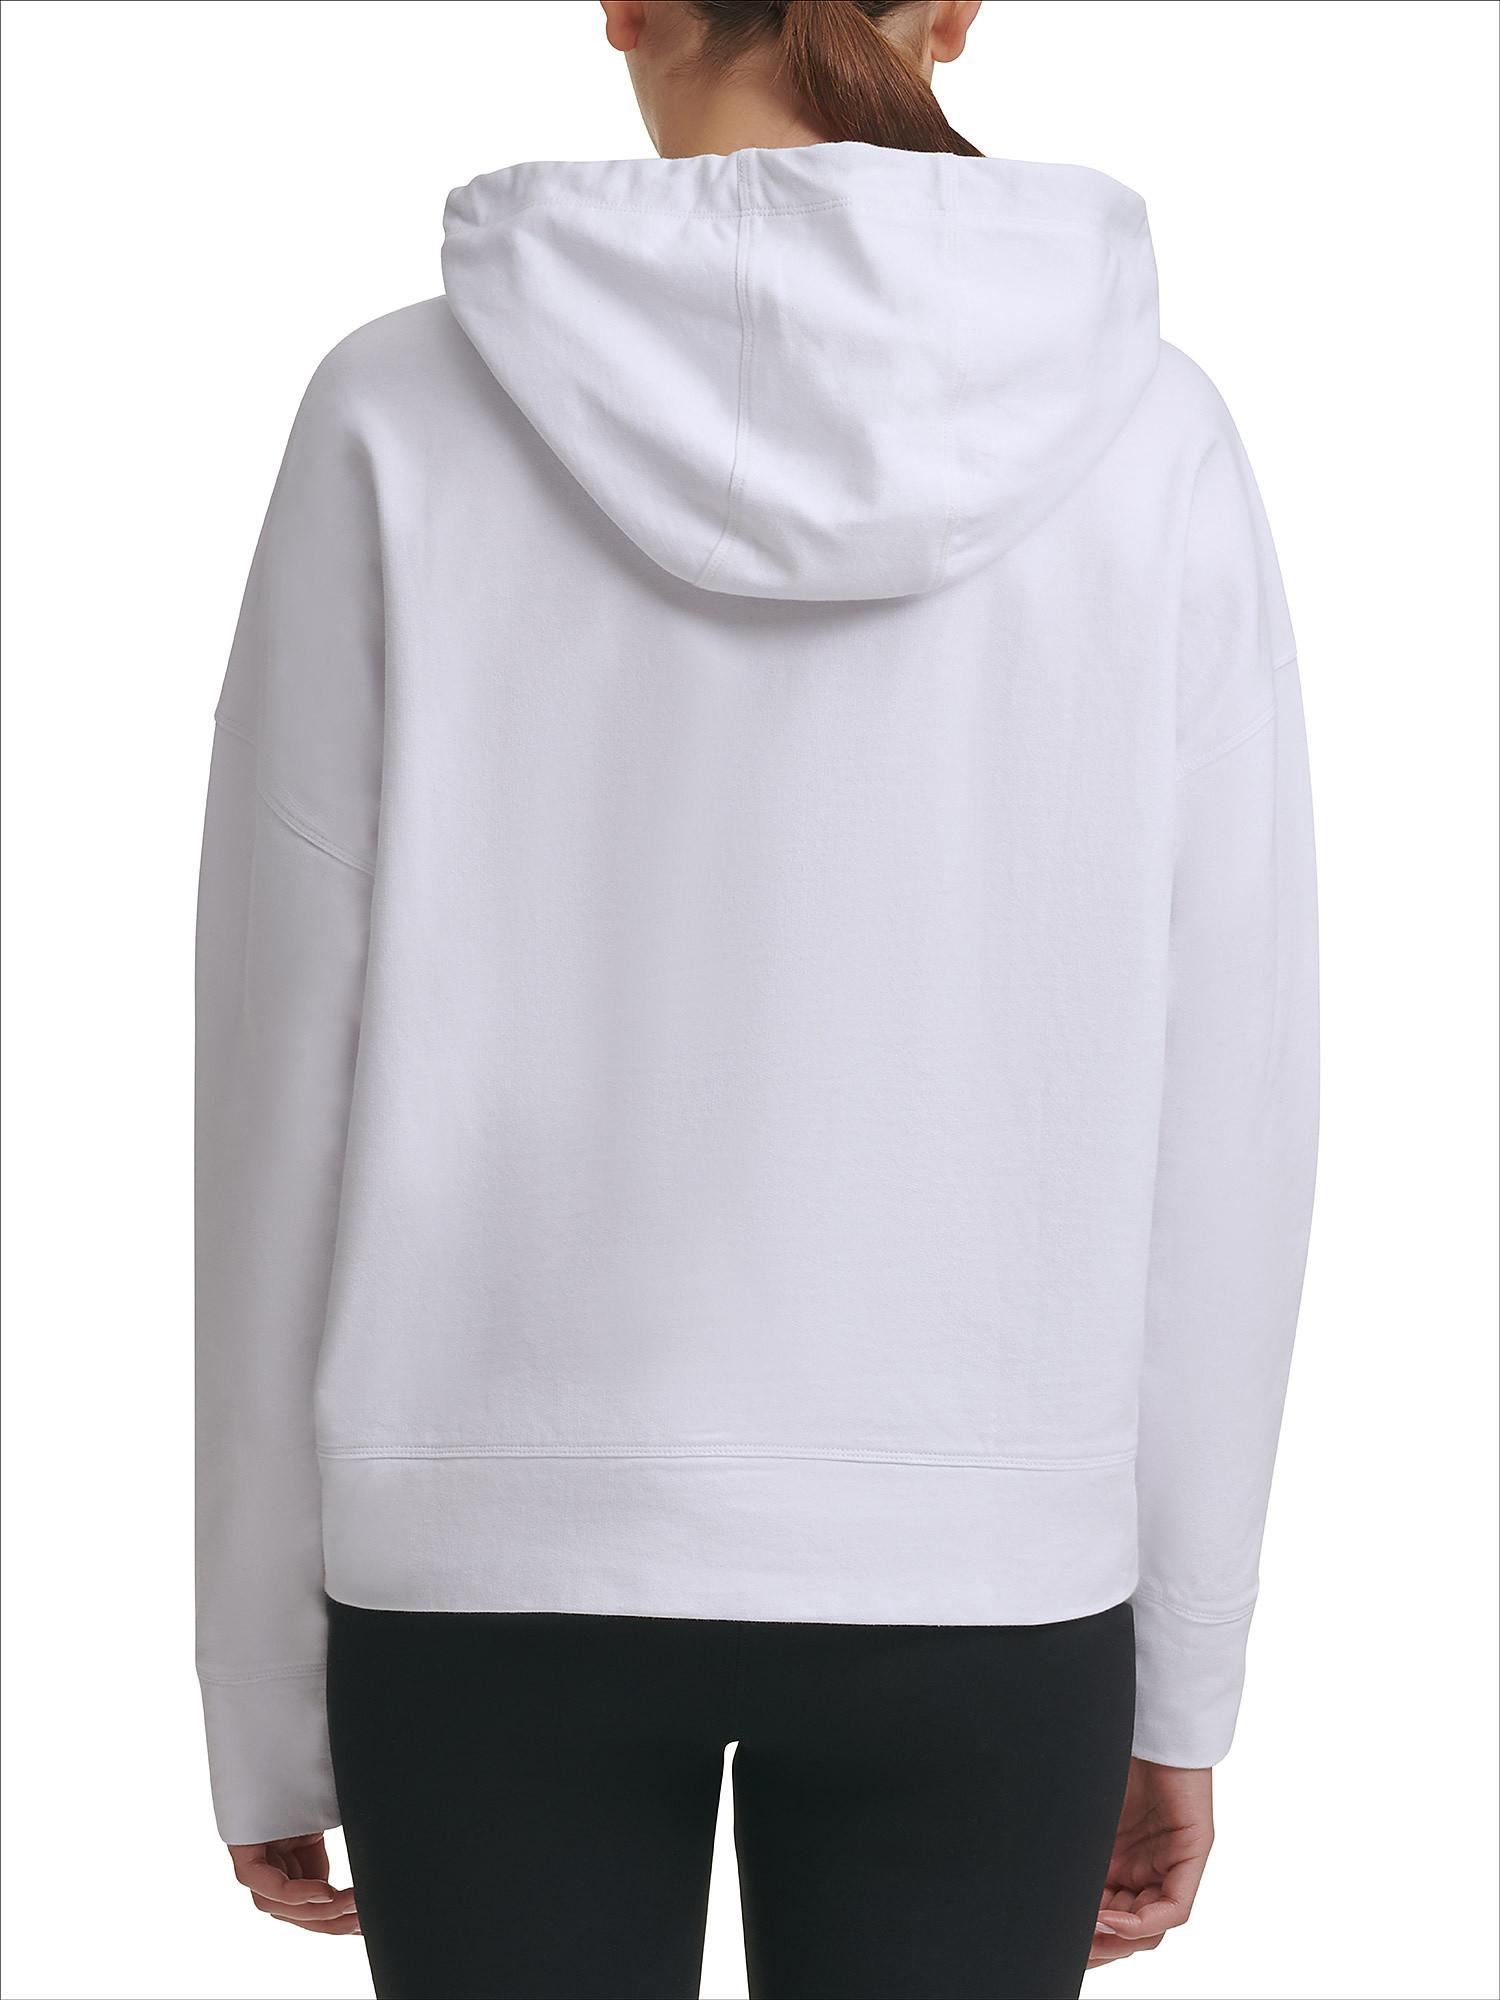 Felpa con logo, Bianco, large image number 3